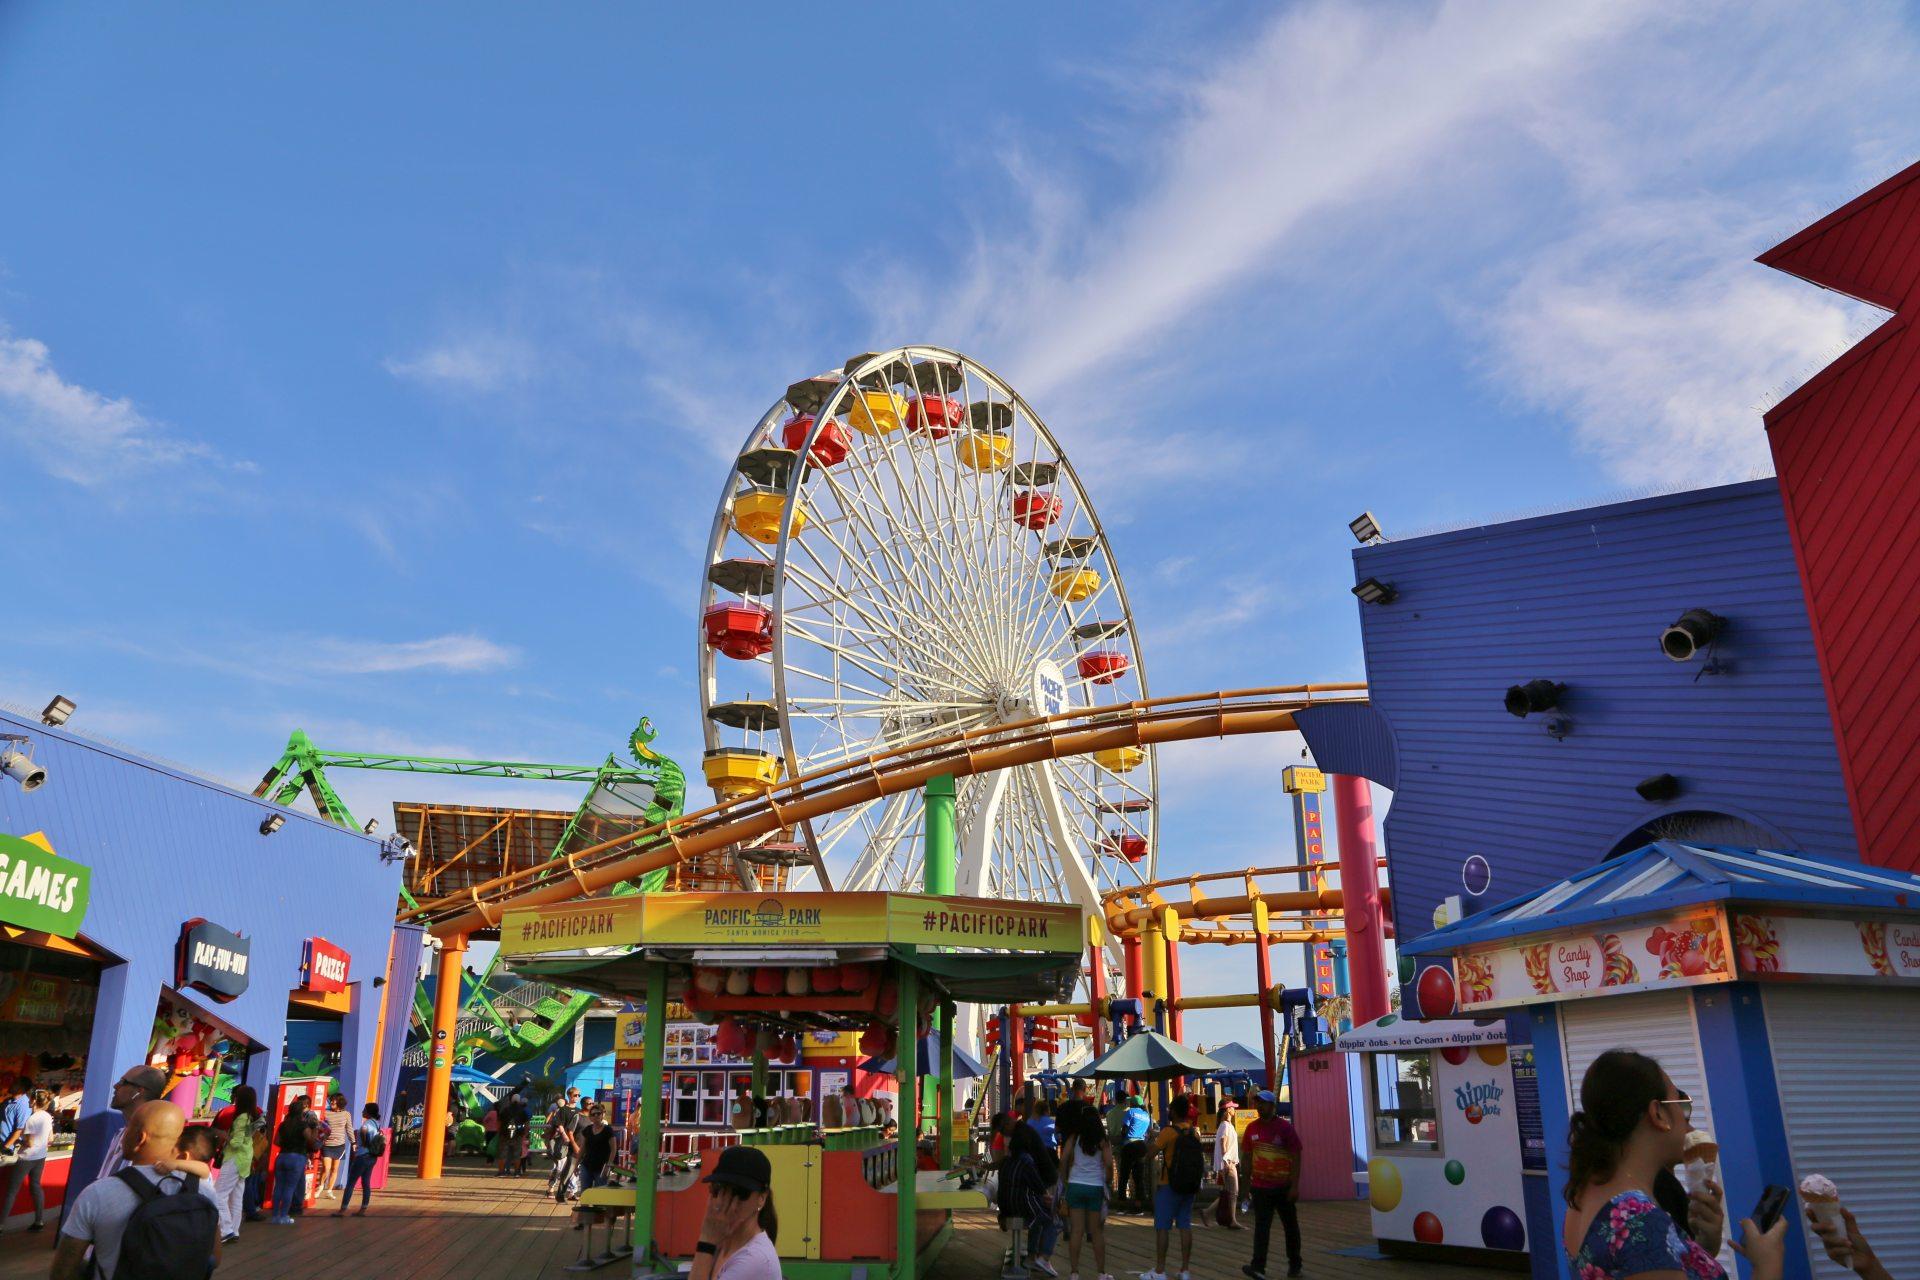 Den Santa Monica Pier den lob ich mir! - Fahrgeschäft, Himmel, Kalifornien, Pacific Park, Riesenrad, Santa Monica, Santa Monica Pier, Vergnügungspark, Wolken - (Santa Monica, California, Vereinigte Staaten)